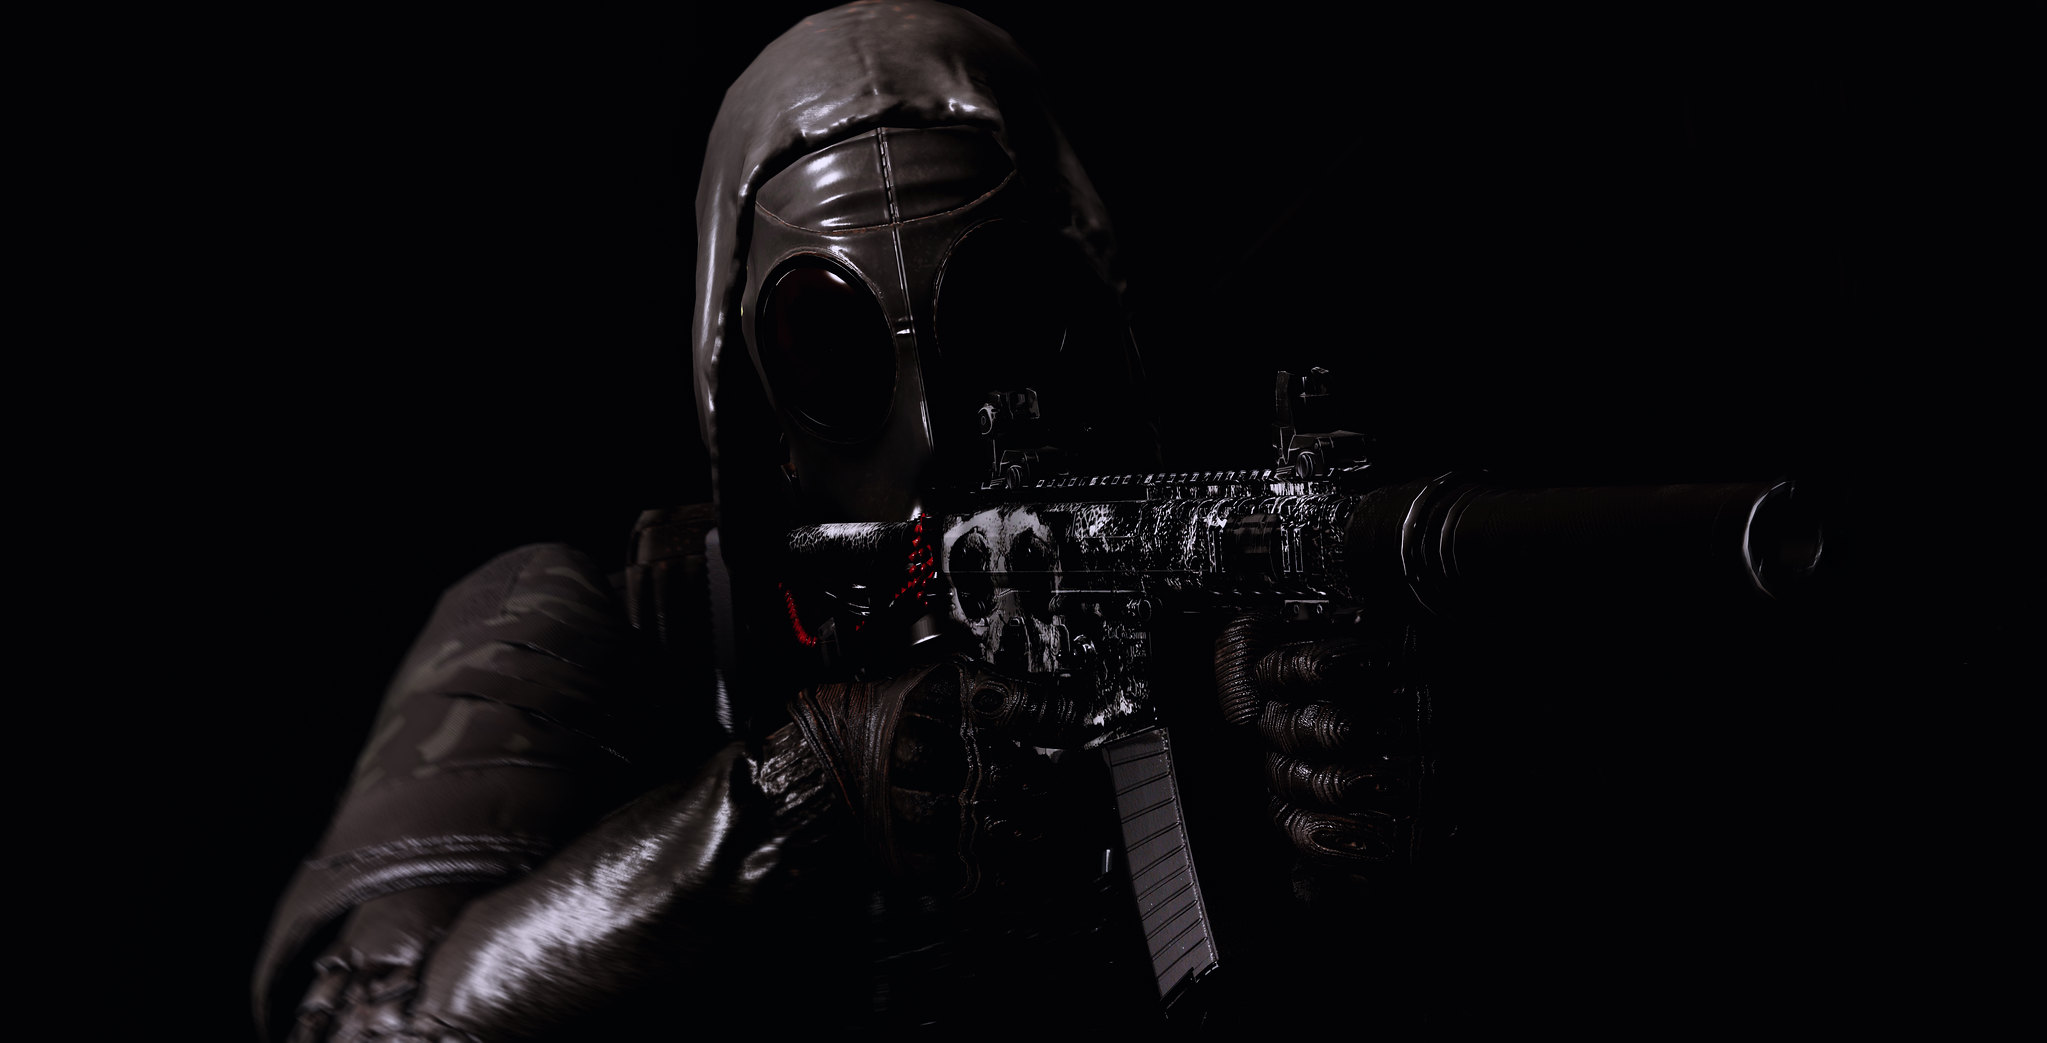 49252679457_c9352eccb0_k.jpg - Tom Clancy's Ghost Recon: Wildlands